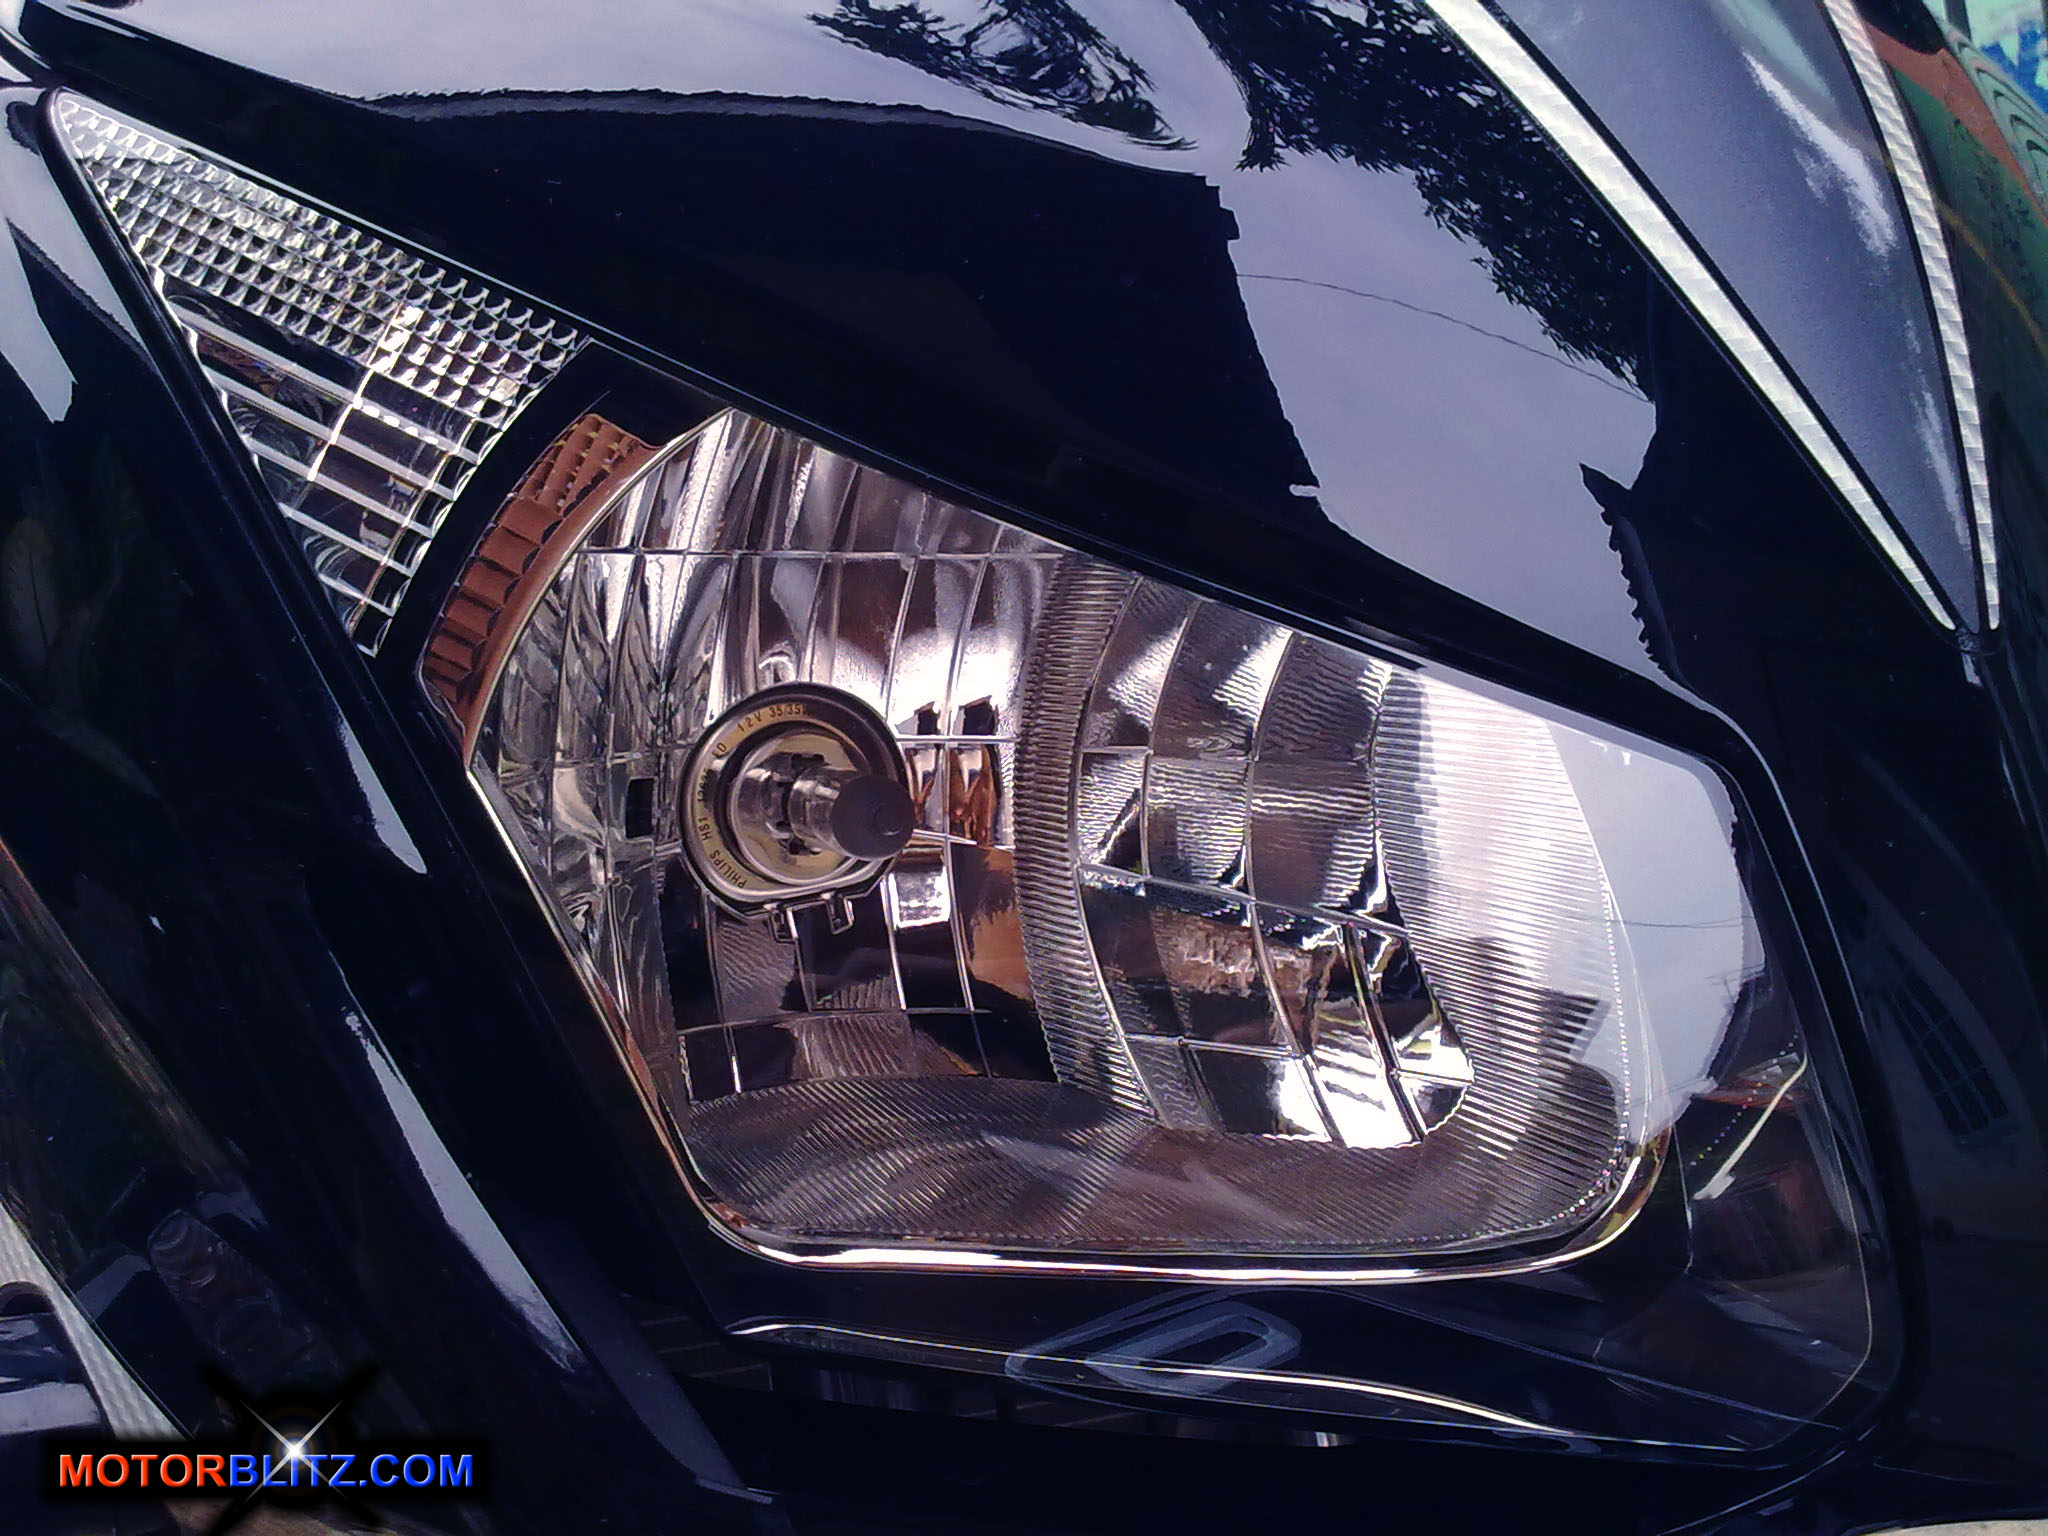 86 Modifikasi Lampu Motor Cbr 150 Terkeren Kucur Batok Cb R Led Atau Dudukan Sen Depan Photo Gallery New Honda Cbr150r Speedy Black Version Dual Keen